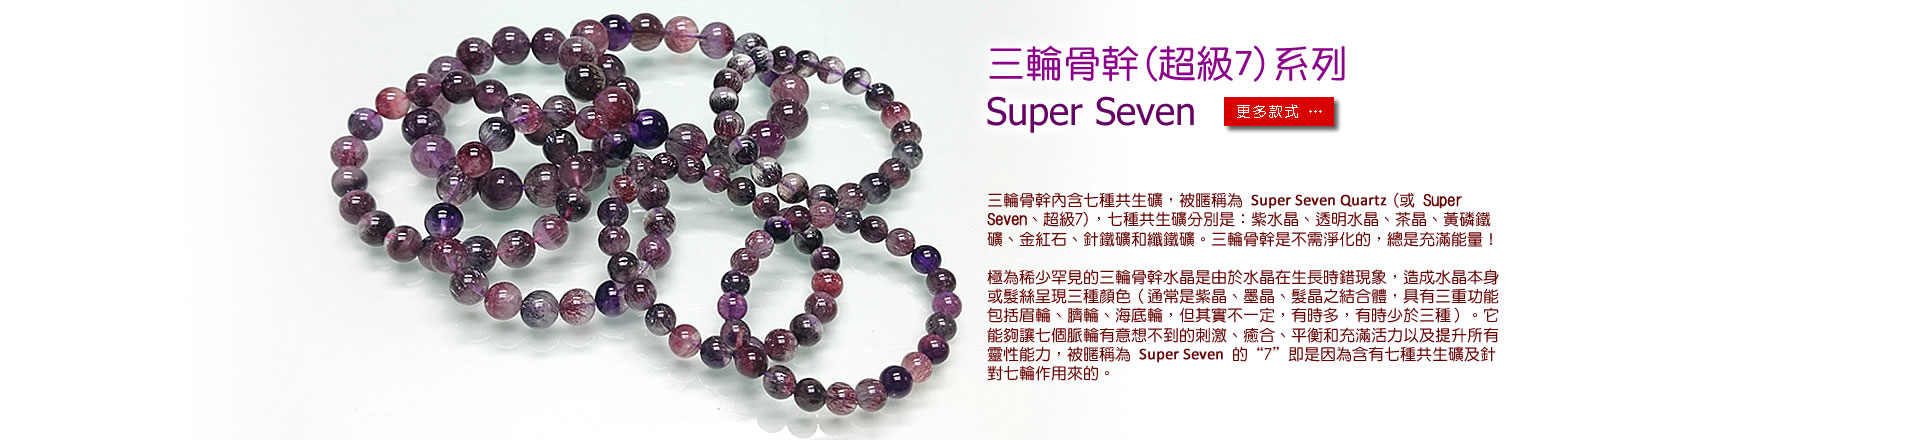 5 三輪骨幹水晶 Super Seven